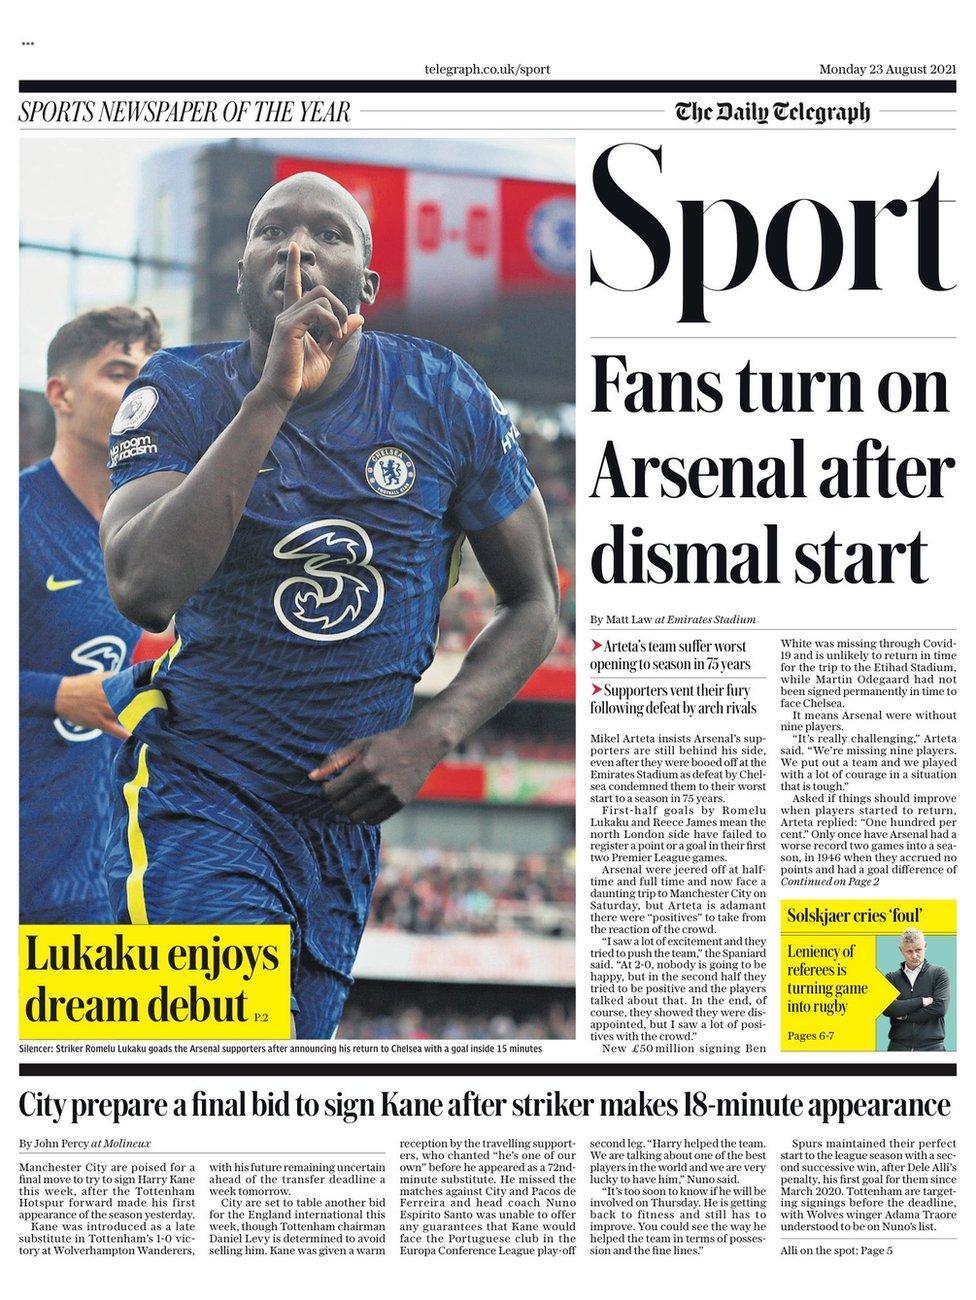 Football Newspaper Headlines: Fans Turn on Arsenal After Dismal Start